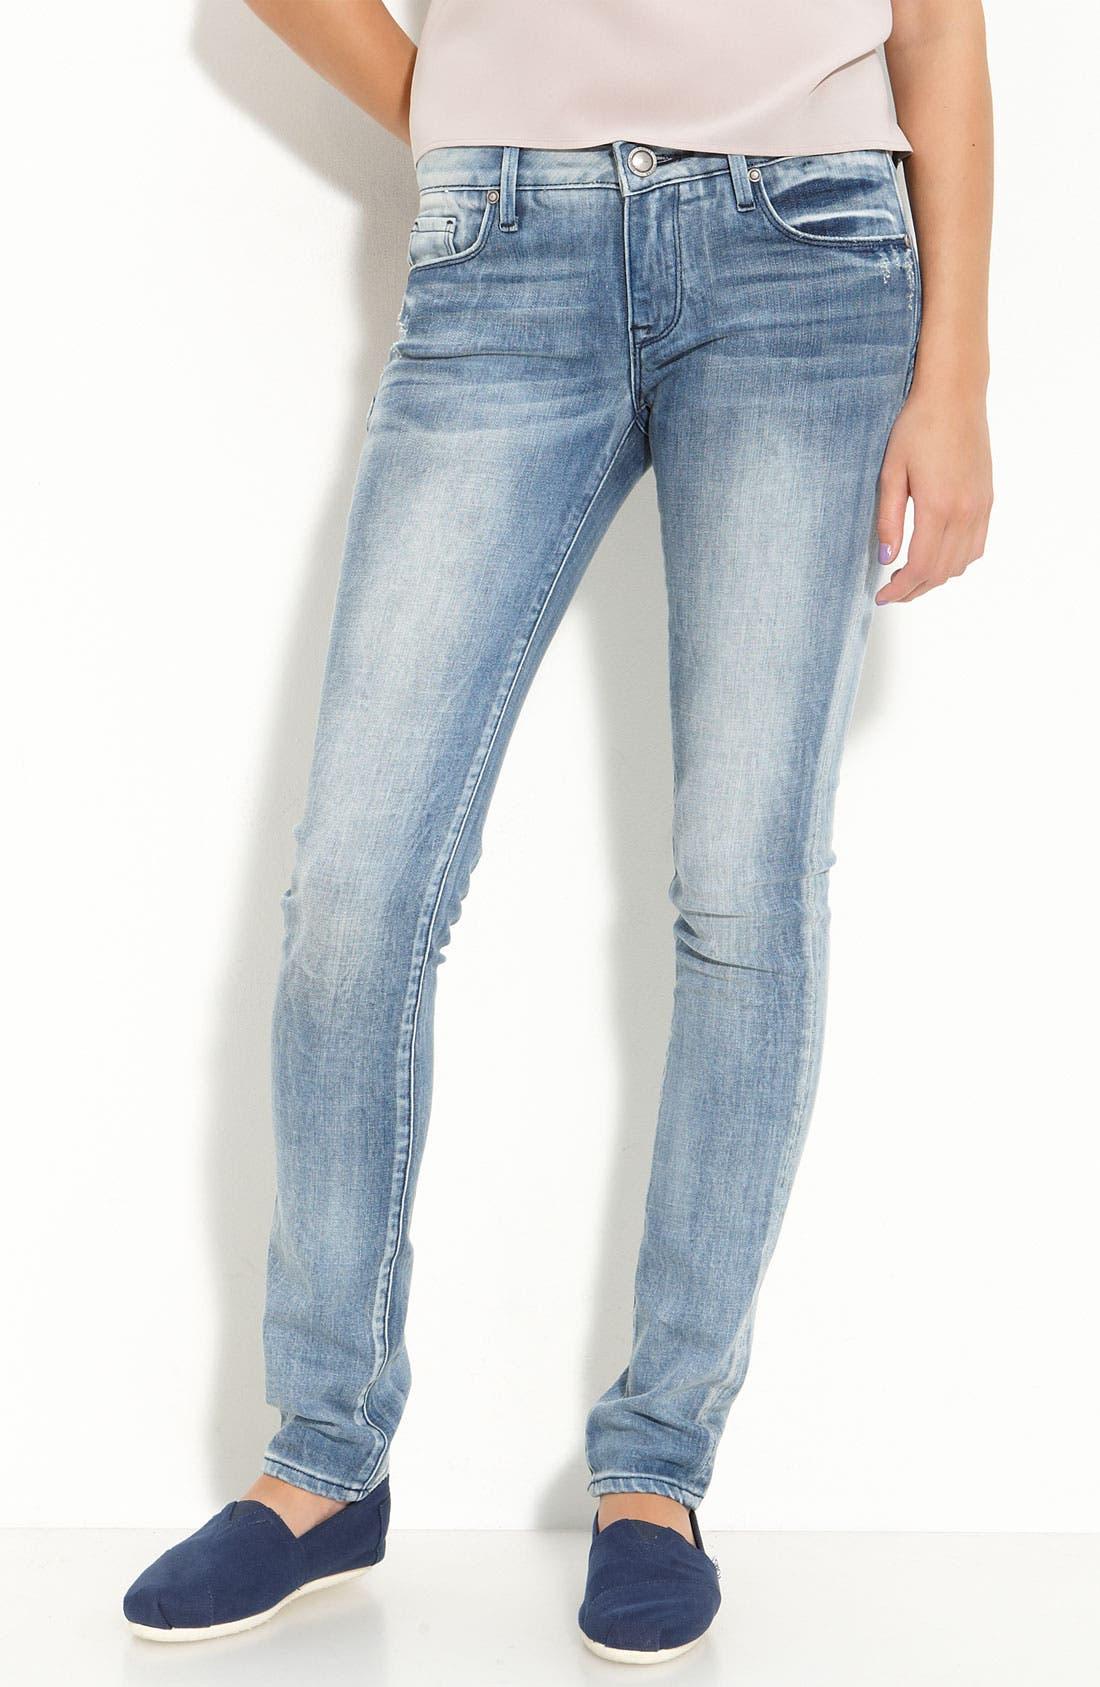 Alternate Image 2  - Vigoss '88' Stretch Denim Skinny Jeans (Light Wash) (Juniors)